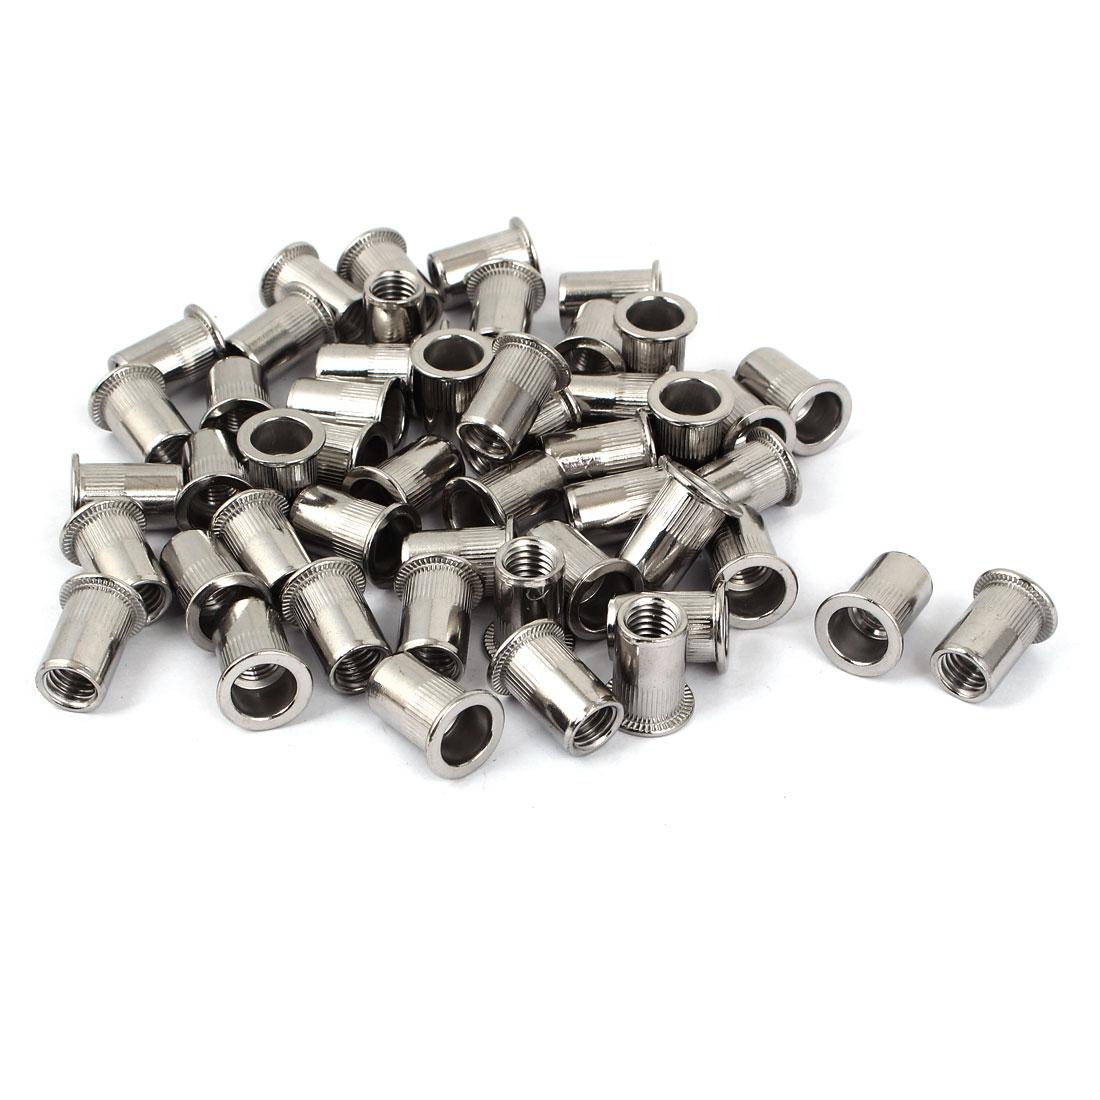 M10 Stainless Steel Flat Head Rivet Nut Insert Nutsert Silver Tone 50pcs